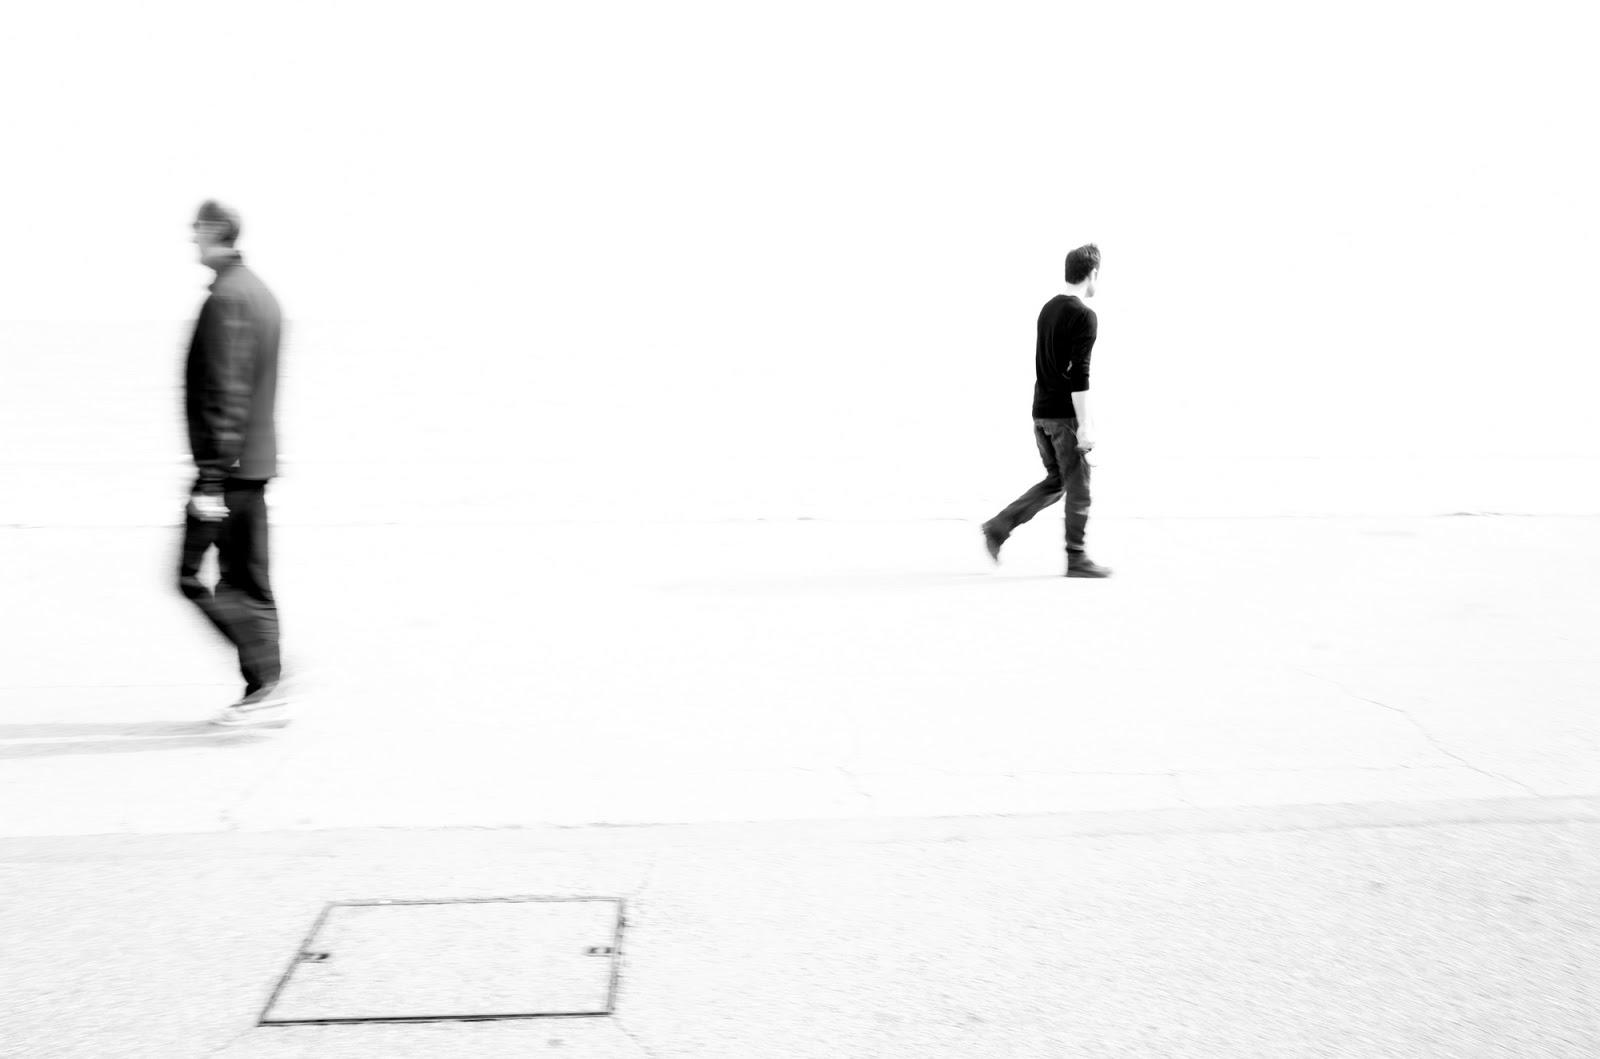 osez pratiquer la photographie minimaliste